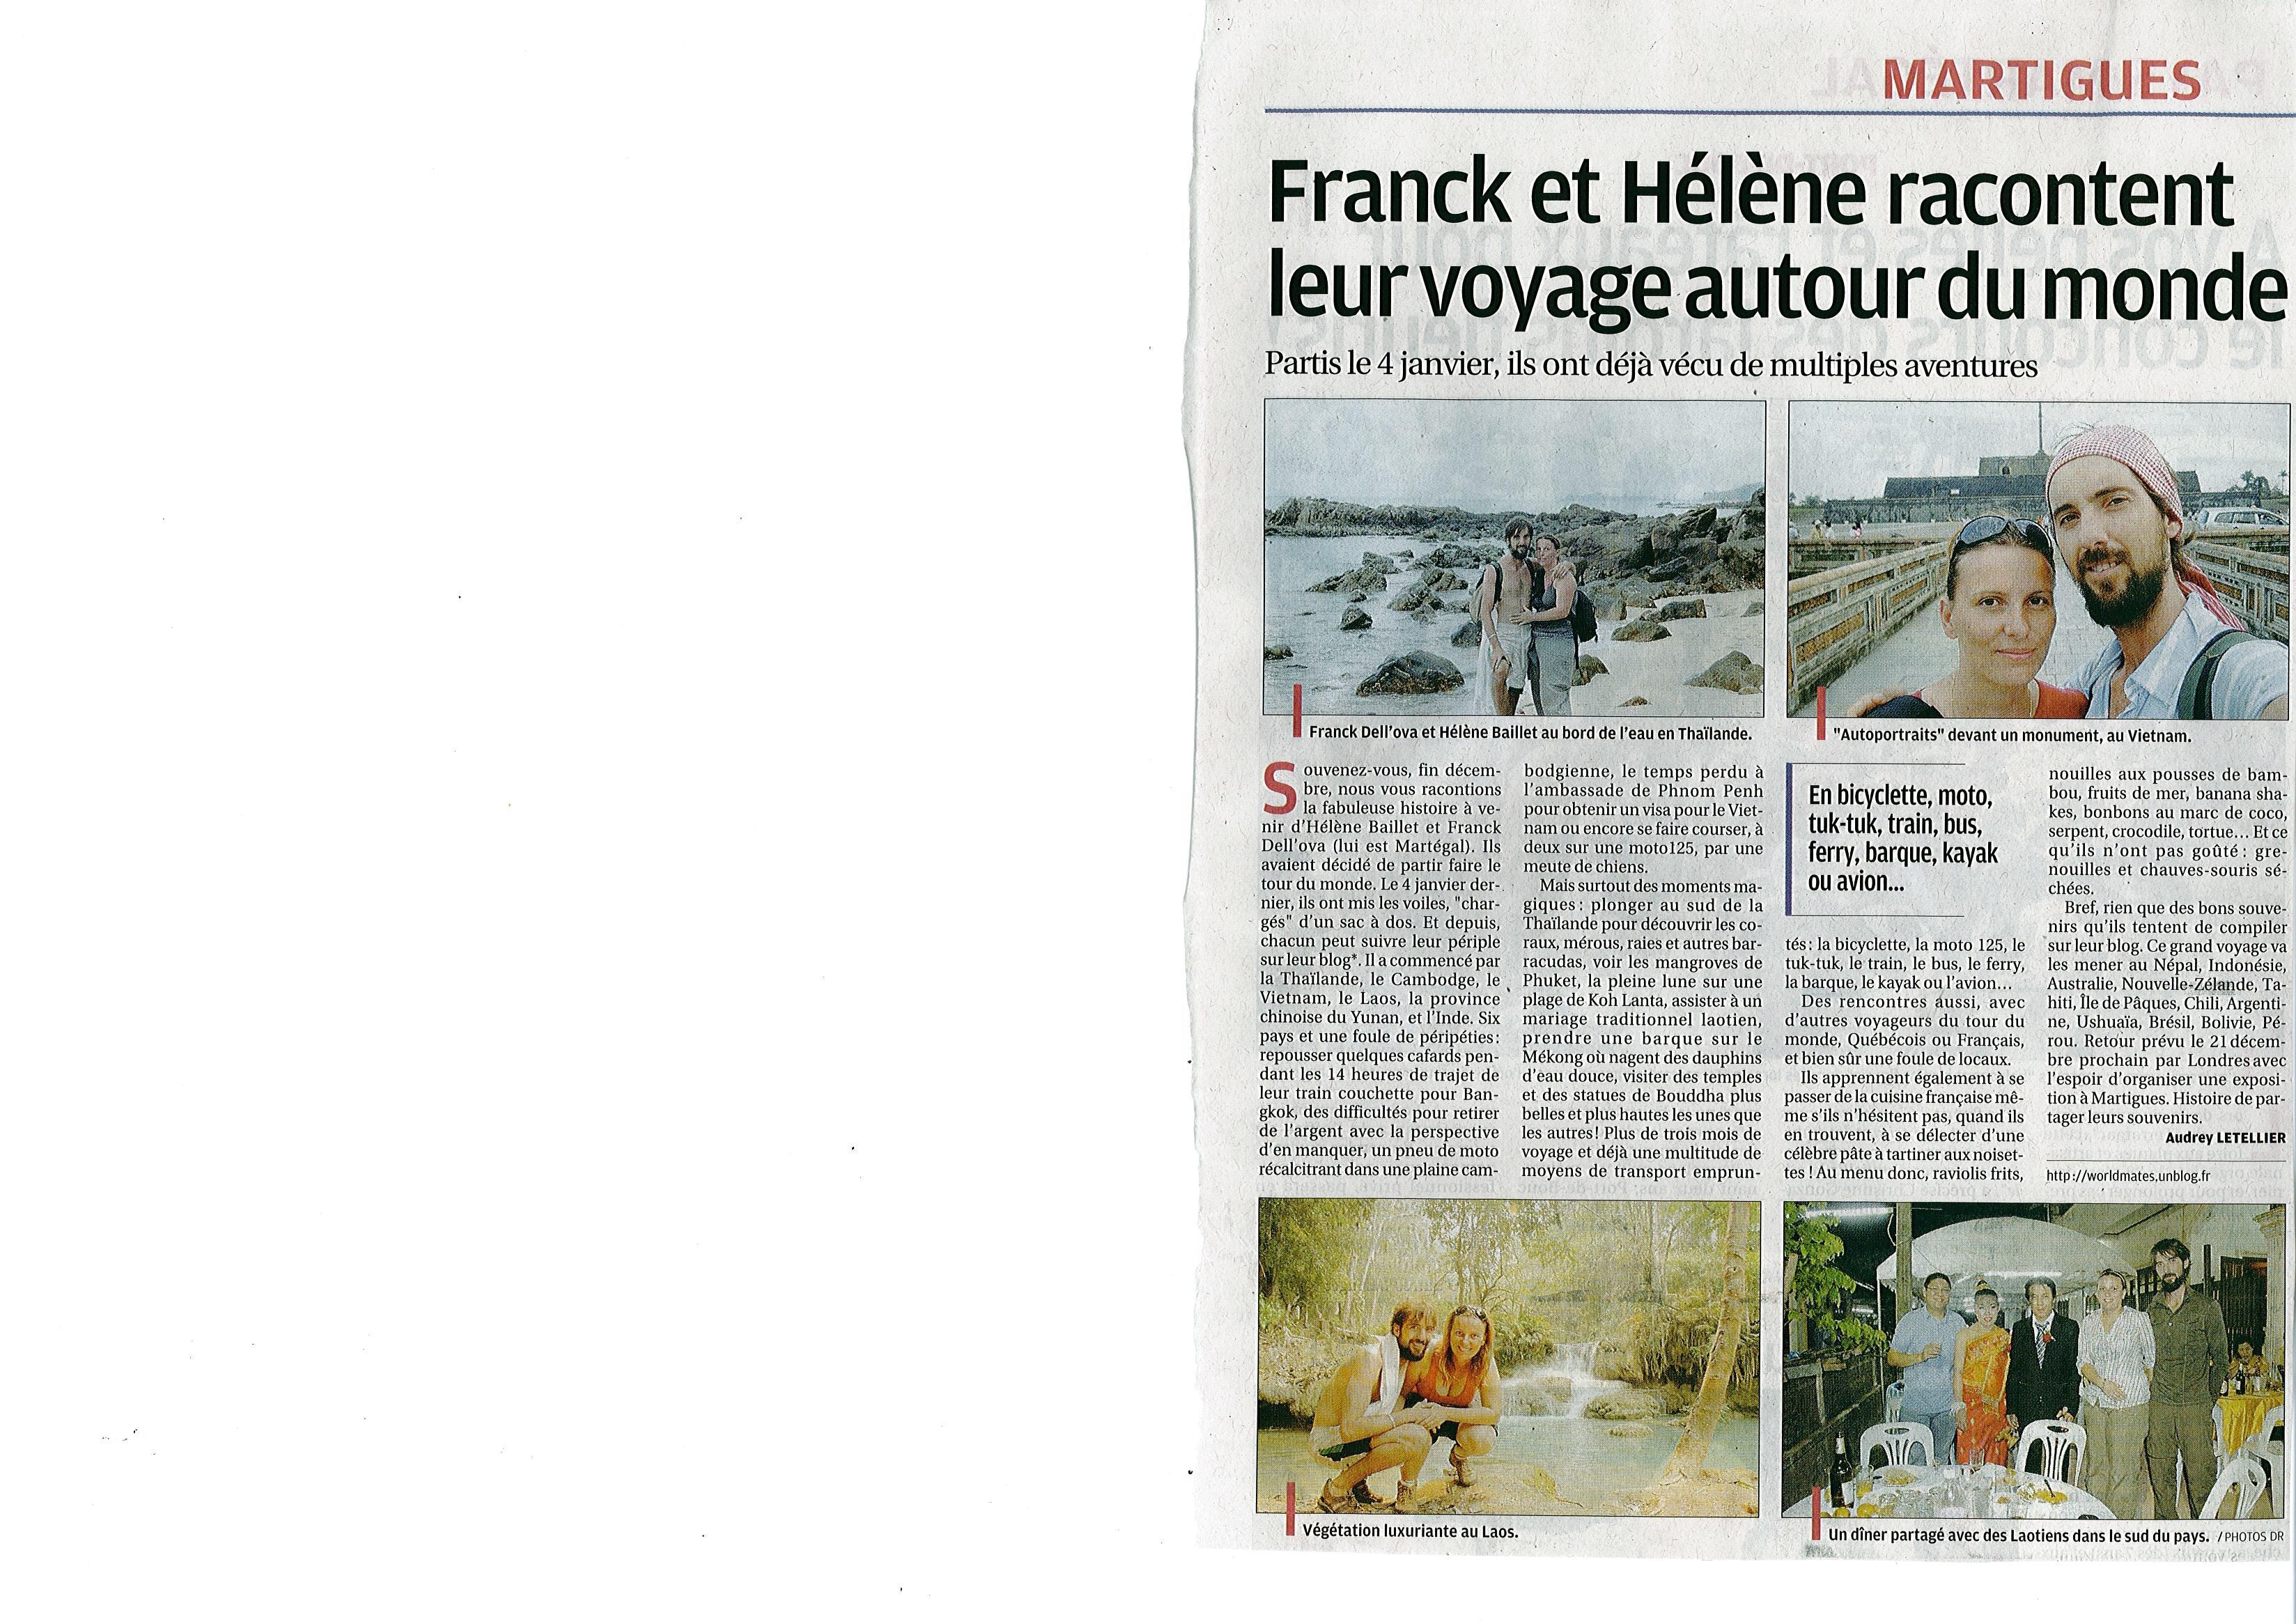 Article La Provence du 13 avrl 2010